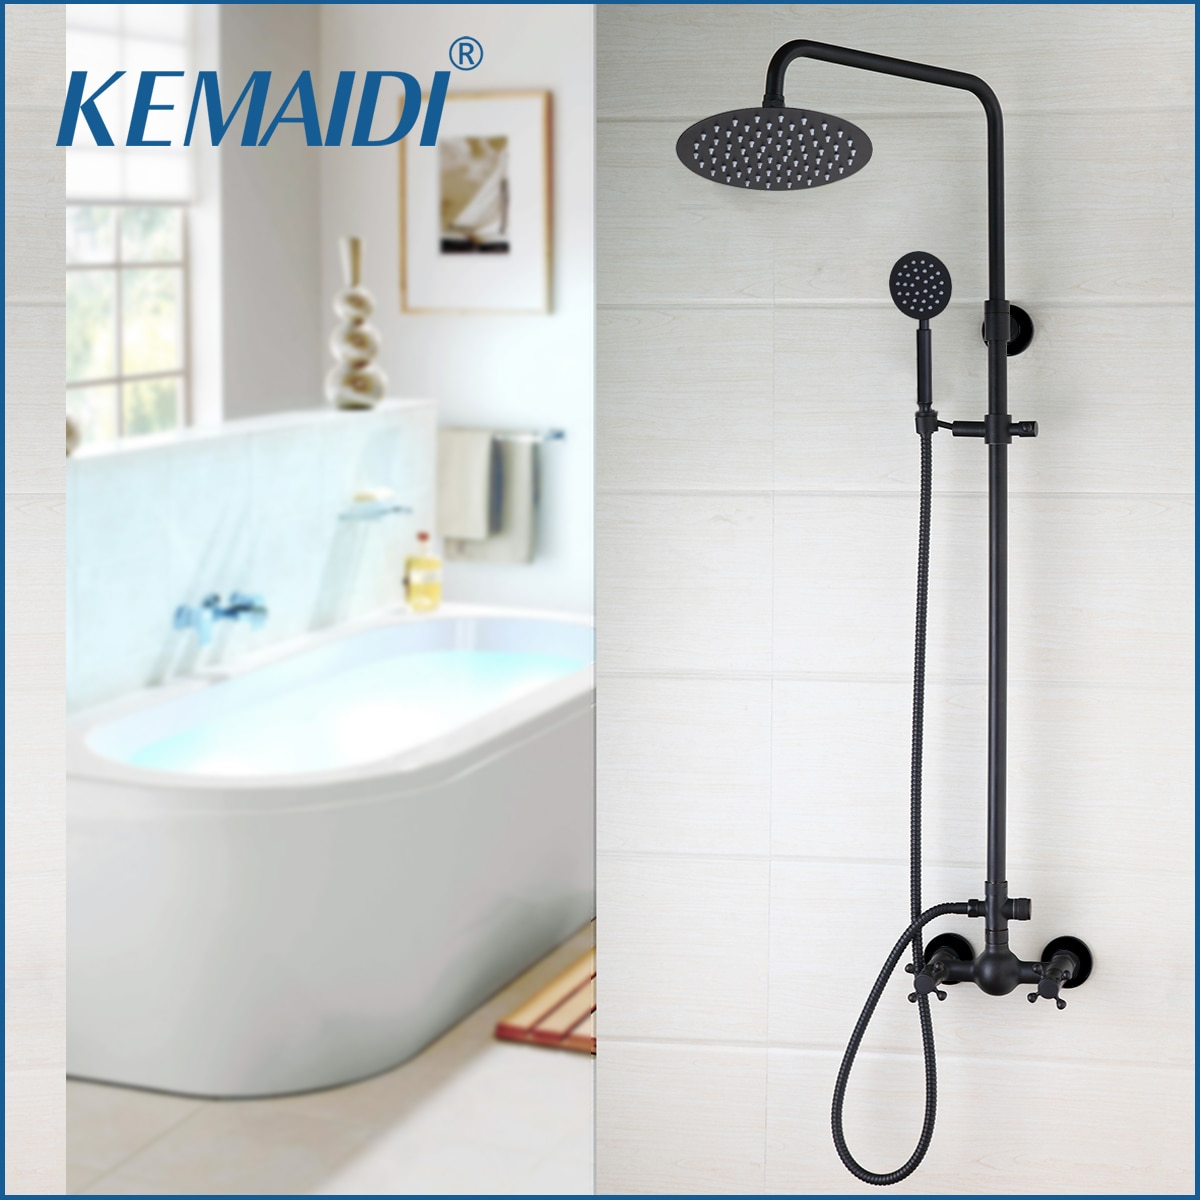 KEMAIDI Black Wall Mount Rainfall 8 Inch Round Head Hand Spray 2 Functions adjustable Hand Bathroom Shower Faucet Set Mixer Taps